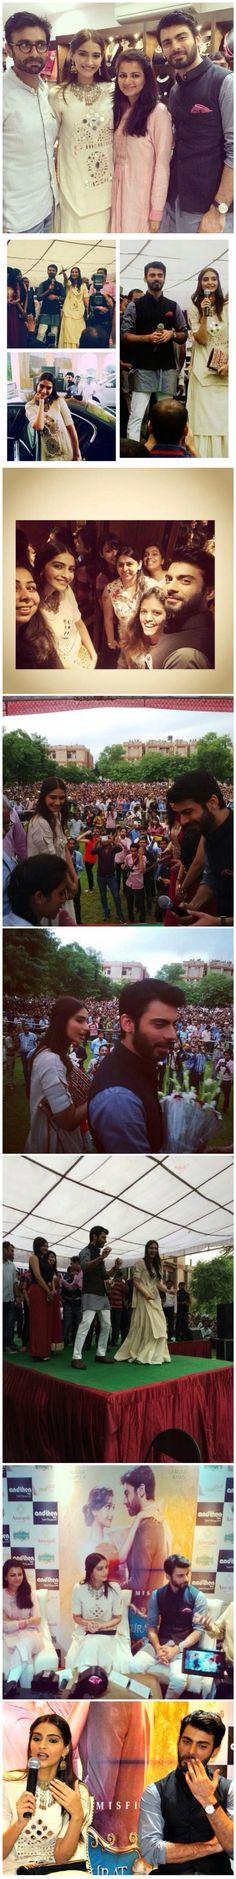 Khoobsurat Diairies: Sonam Kapoor & Fawad Khan create mass frenzy in Jaipur.